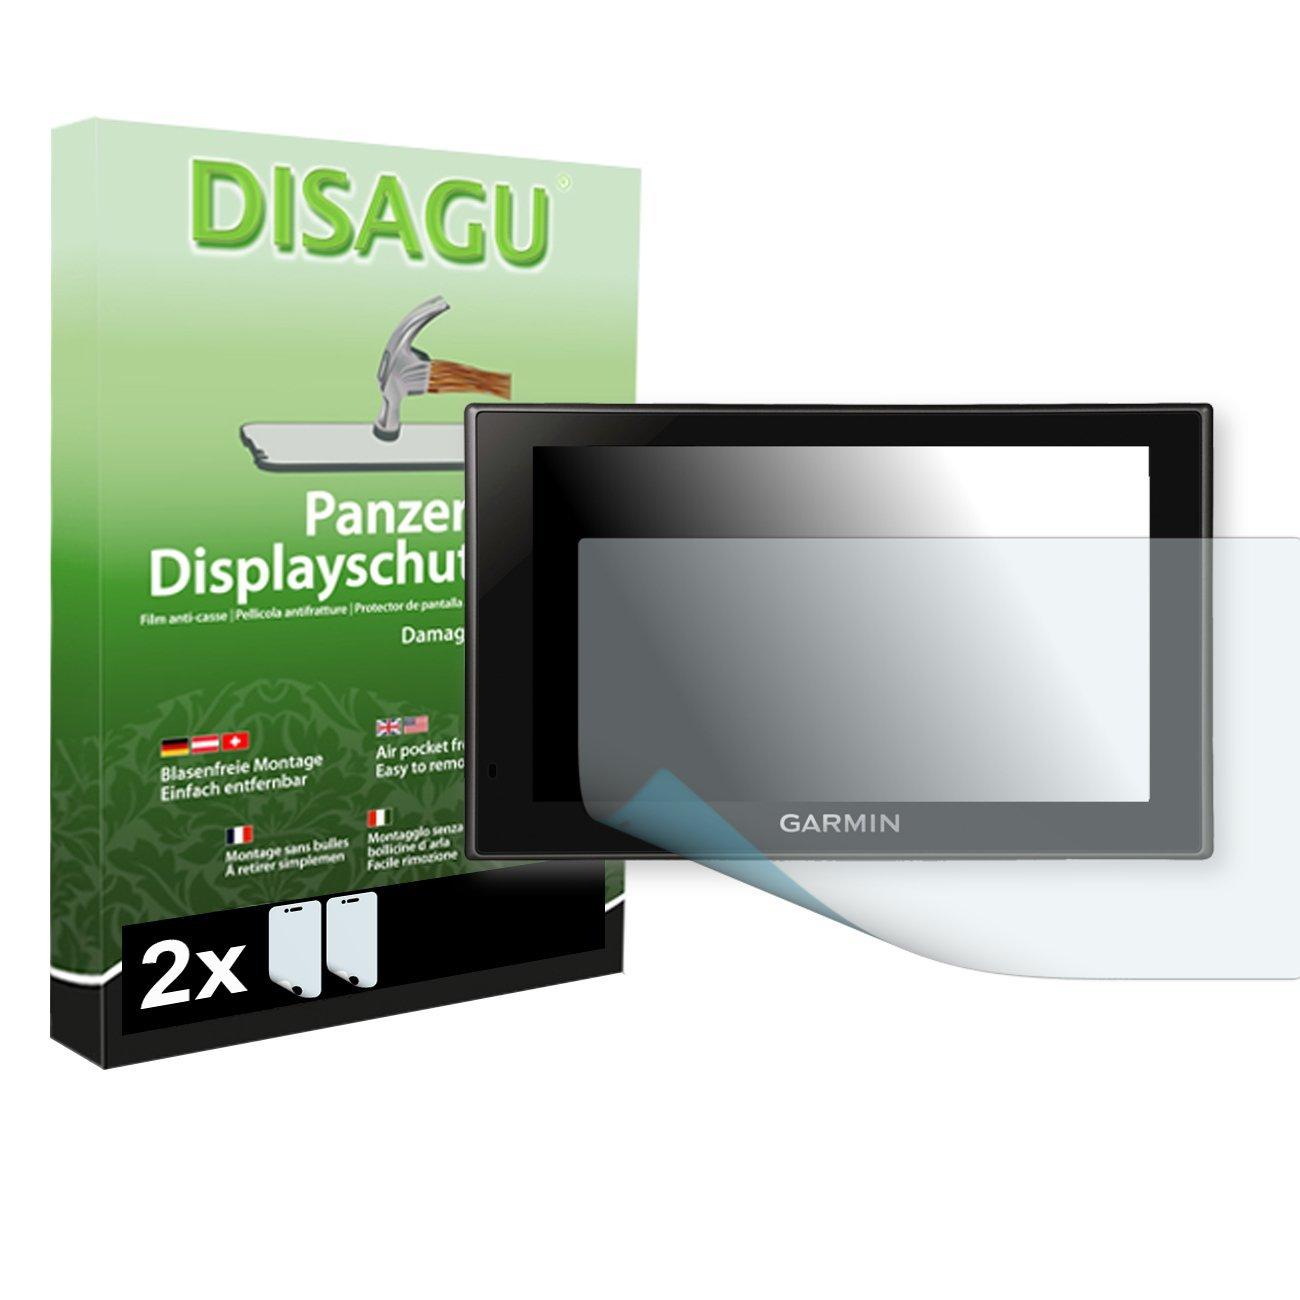 2 x DISAGU Armor screen protector for Garmin Camper 660 LMT screen fracture protection film